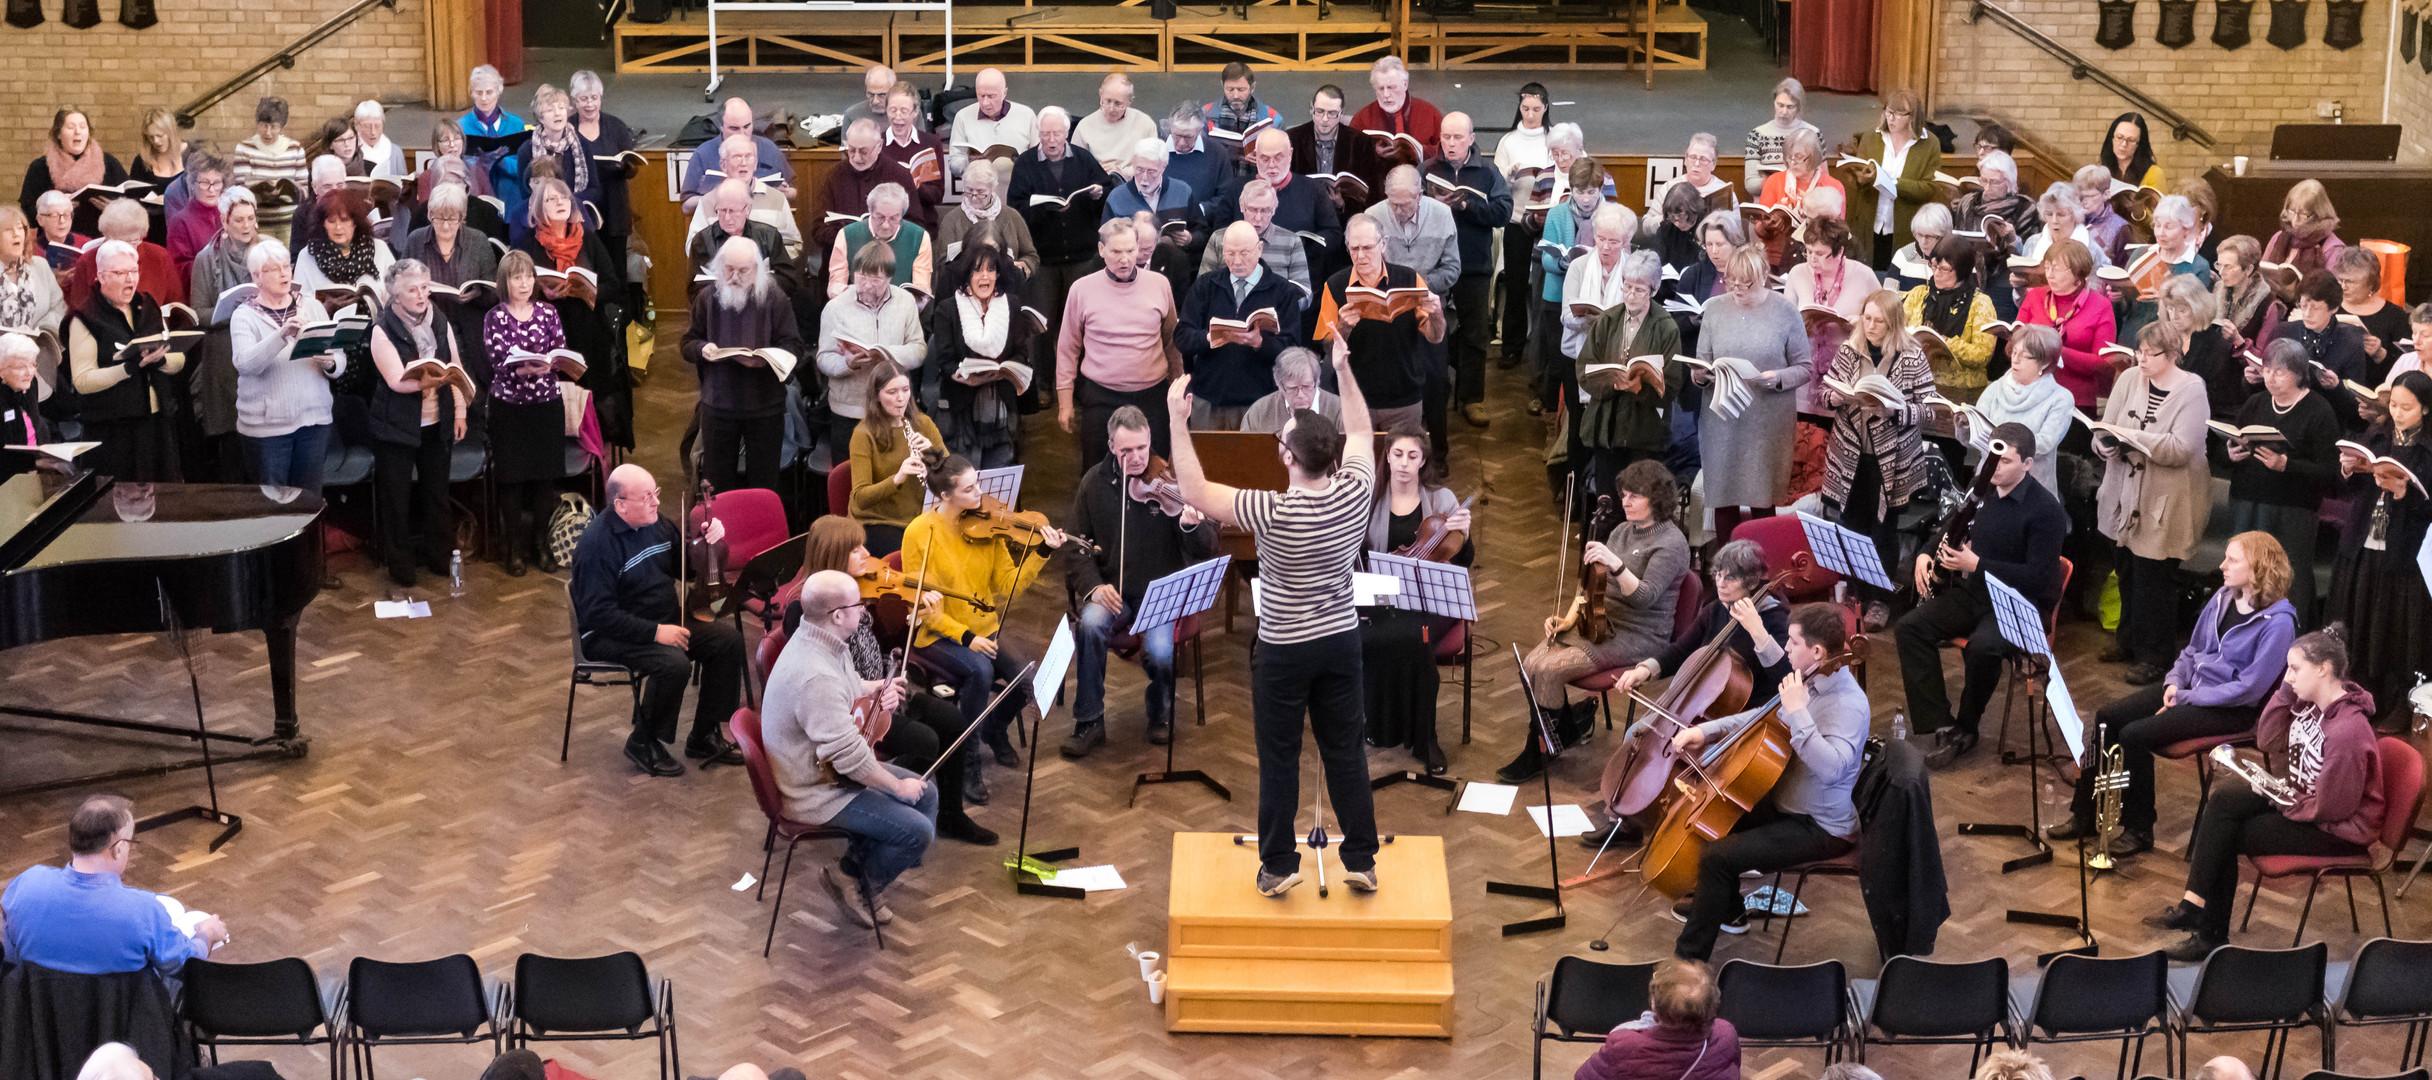 January 2016 - Play & Sing, Handel's Messiah